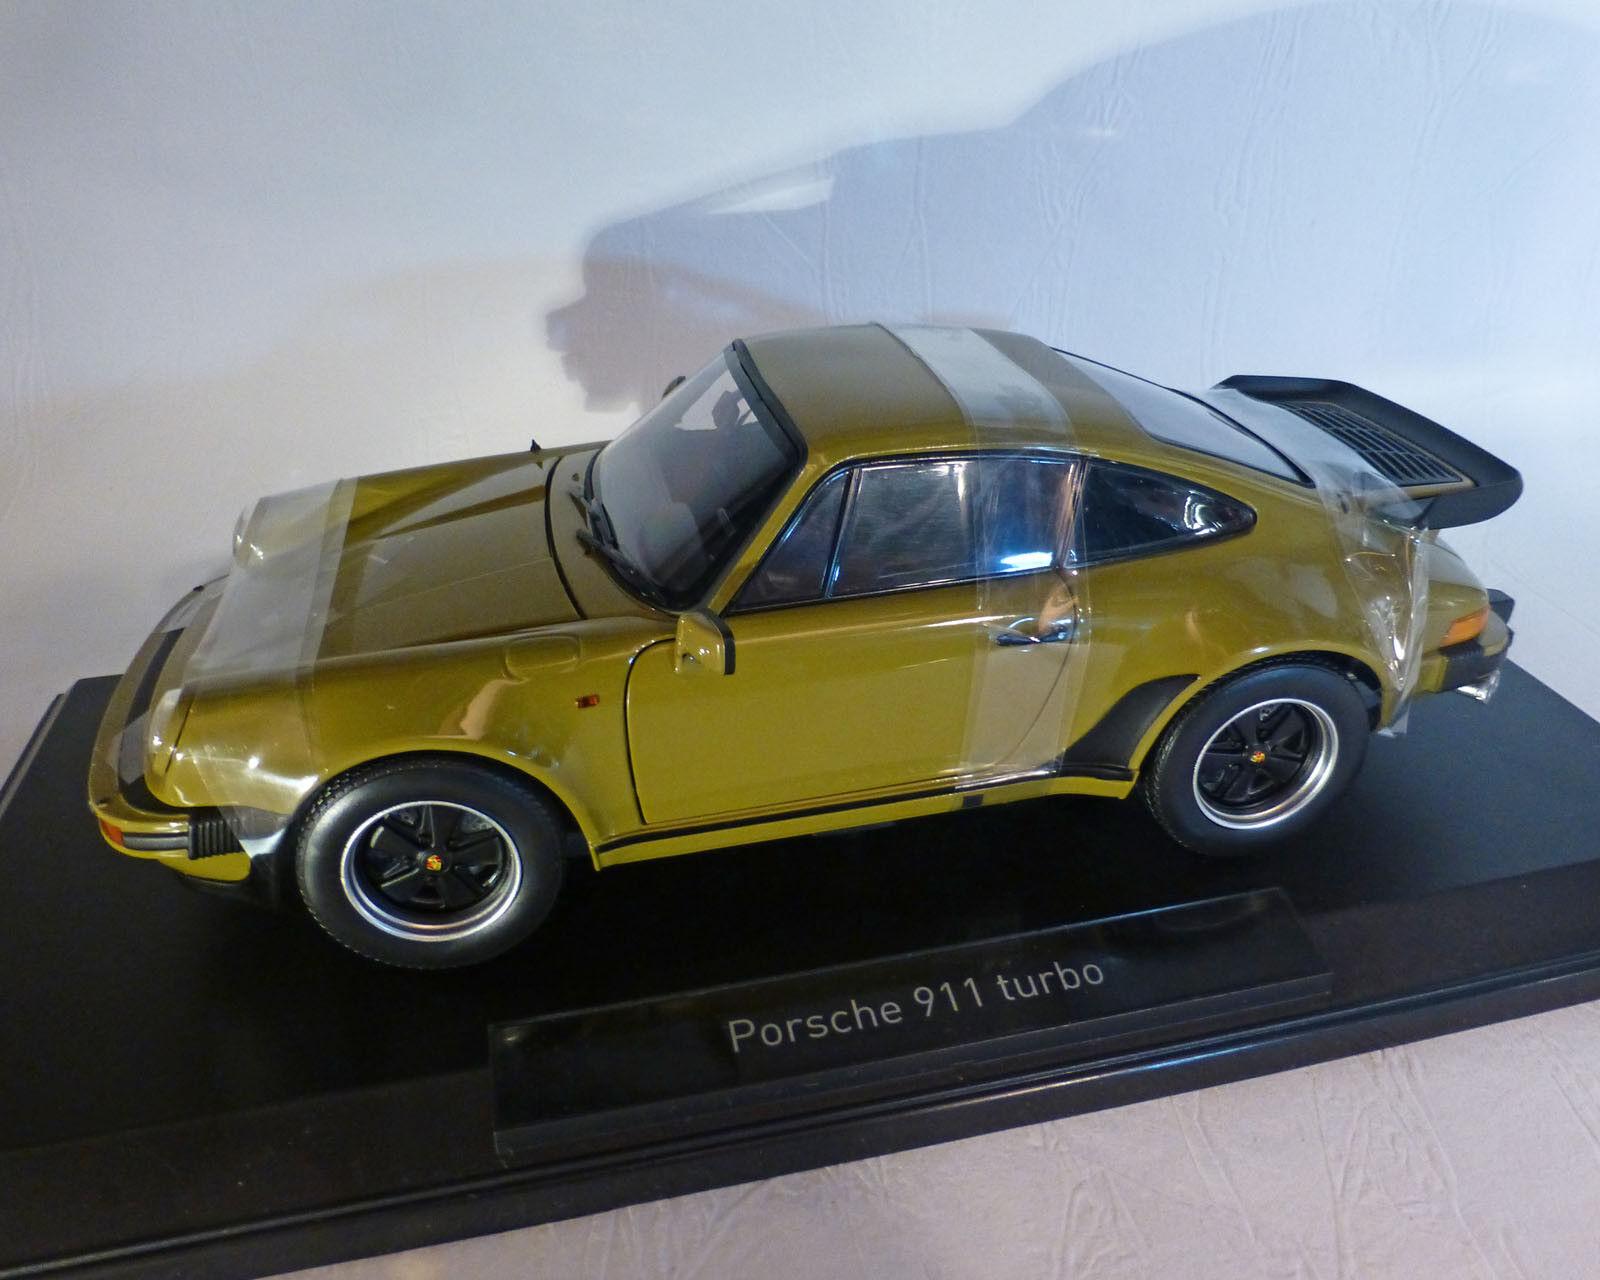 Porsche 911 turbo 3,3 L, 1977, verde oliva, 1 18 norev